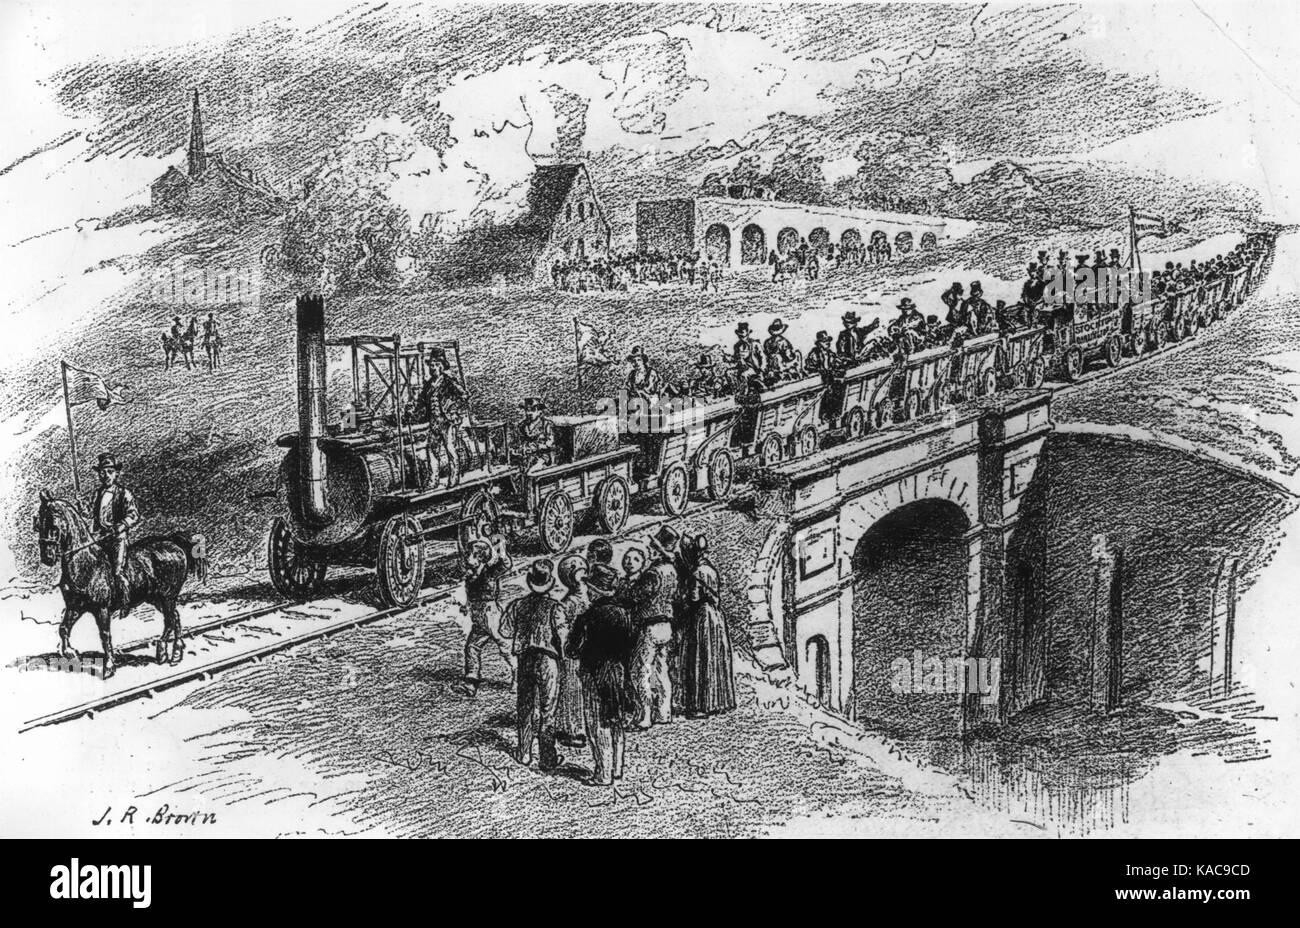 Stockton & Darlington Railway (Brown via Getty Images) Stock Photo